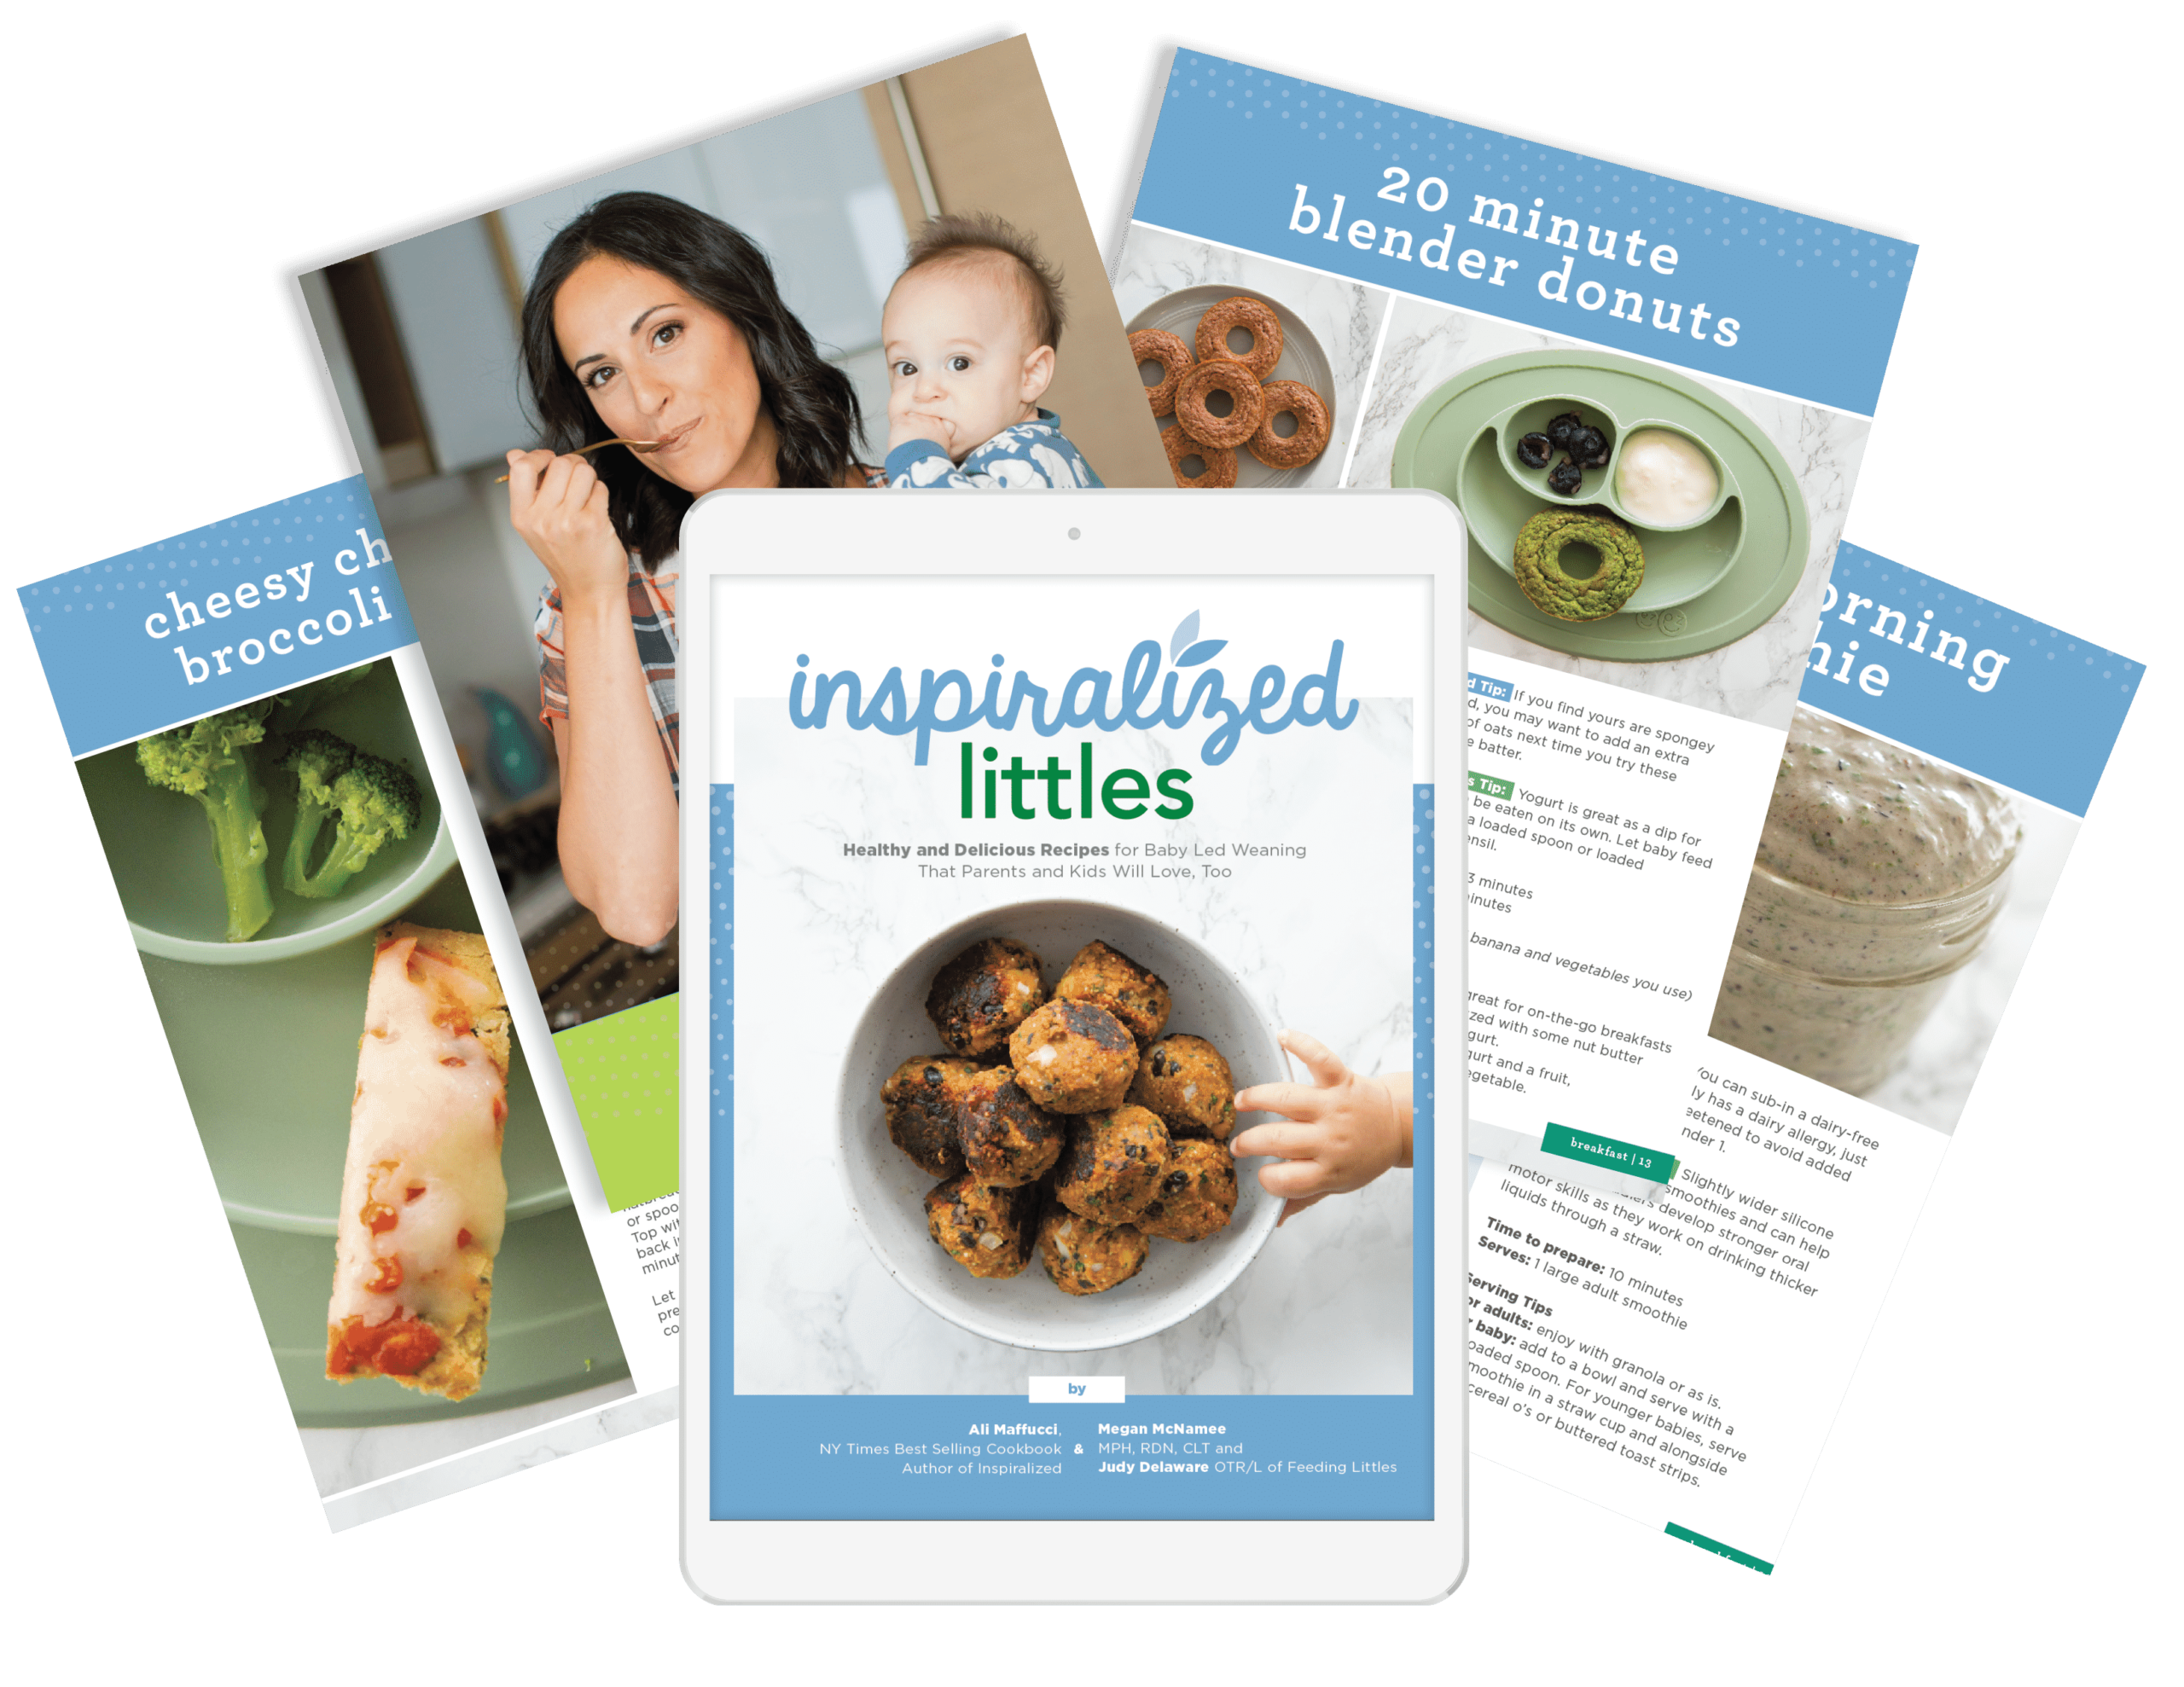 Inspiralized Littles Baby Led Weaning eCookbook